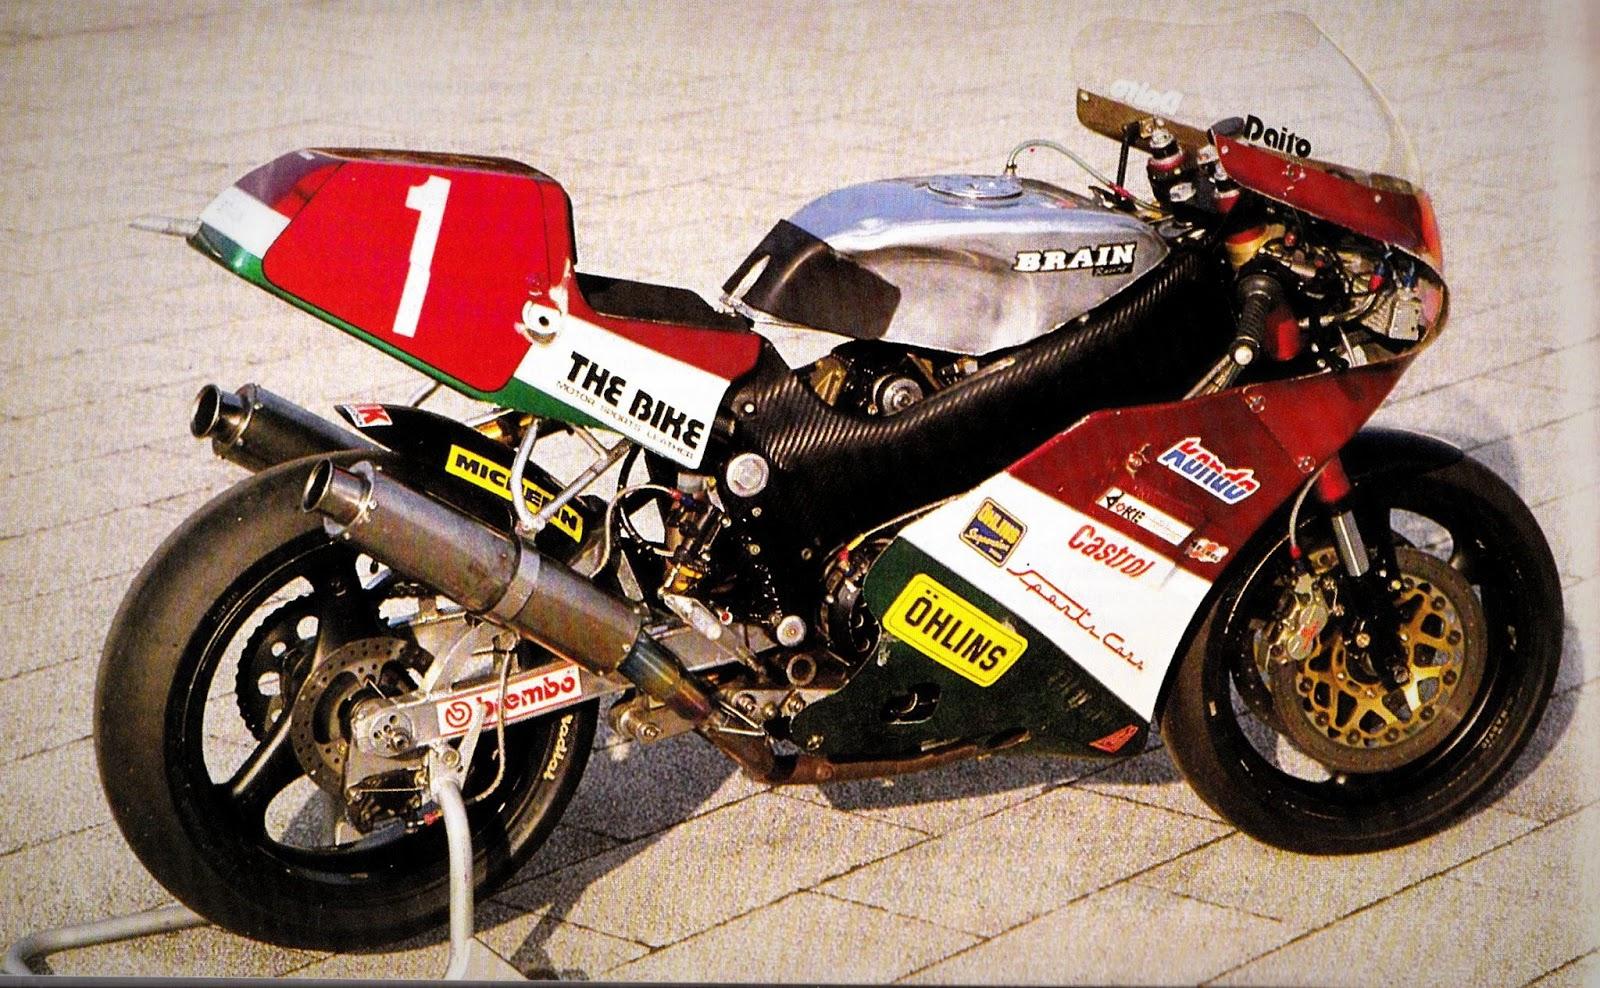 Brain Ducati CF 01 - RocketGarage - Cafe Racer Magazine